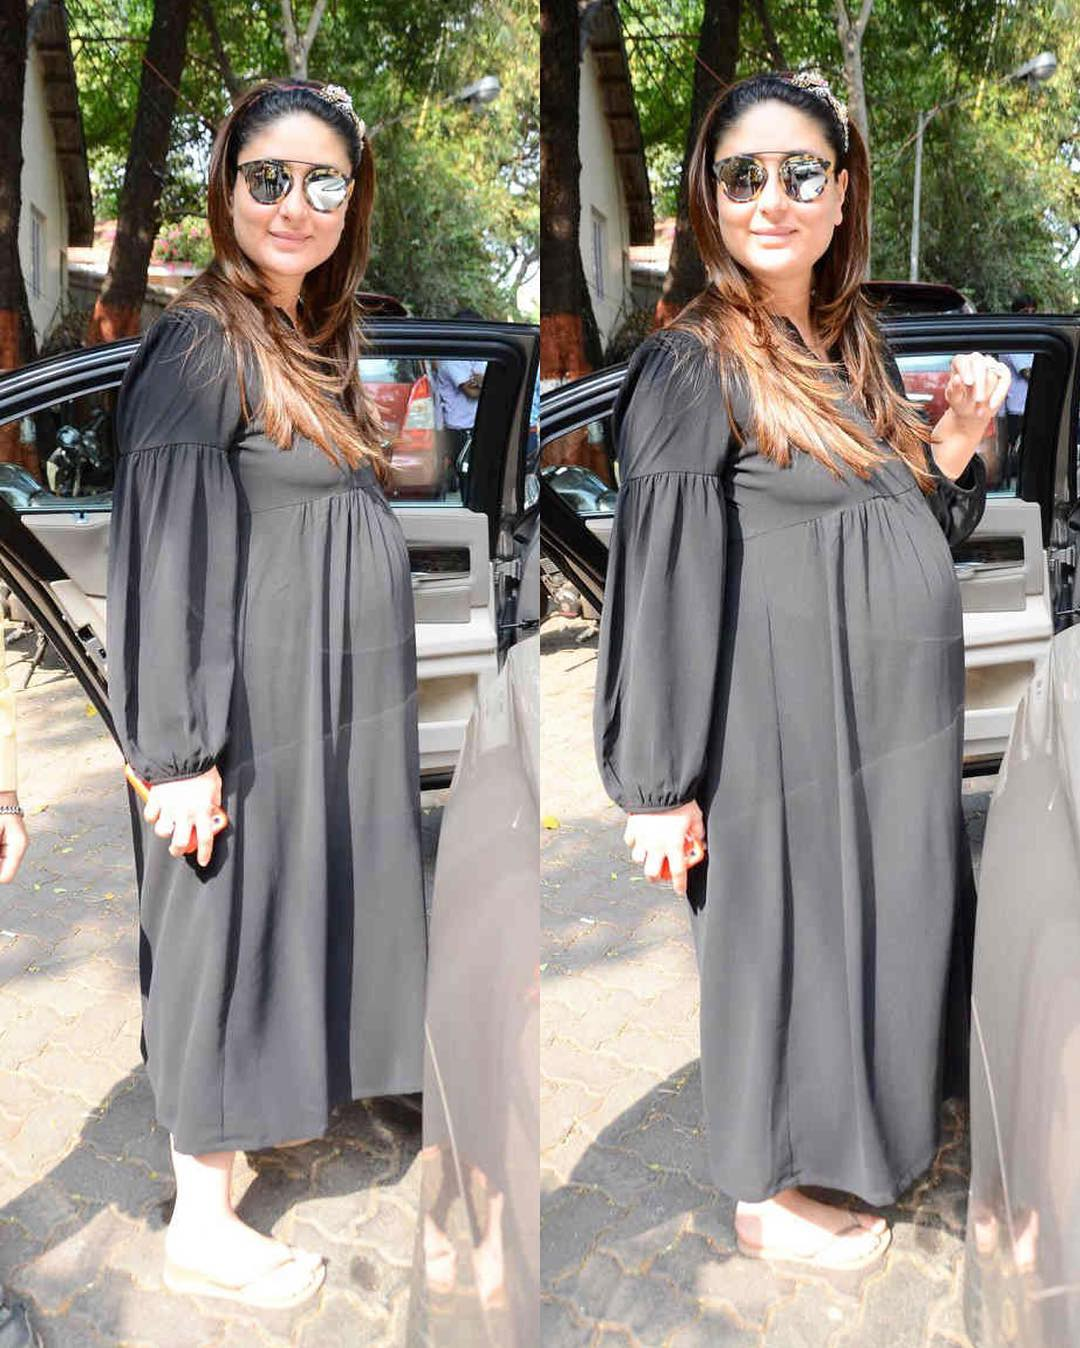 Kareena Kapoor Delivered Baby Boy - Healthy Pregnancy Secret